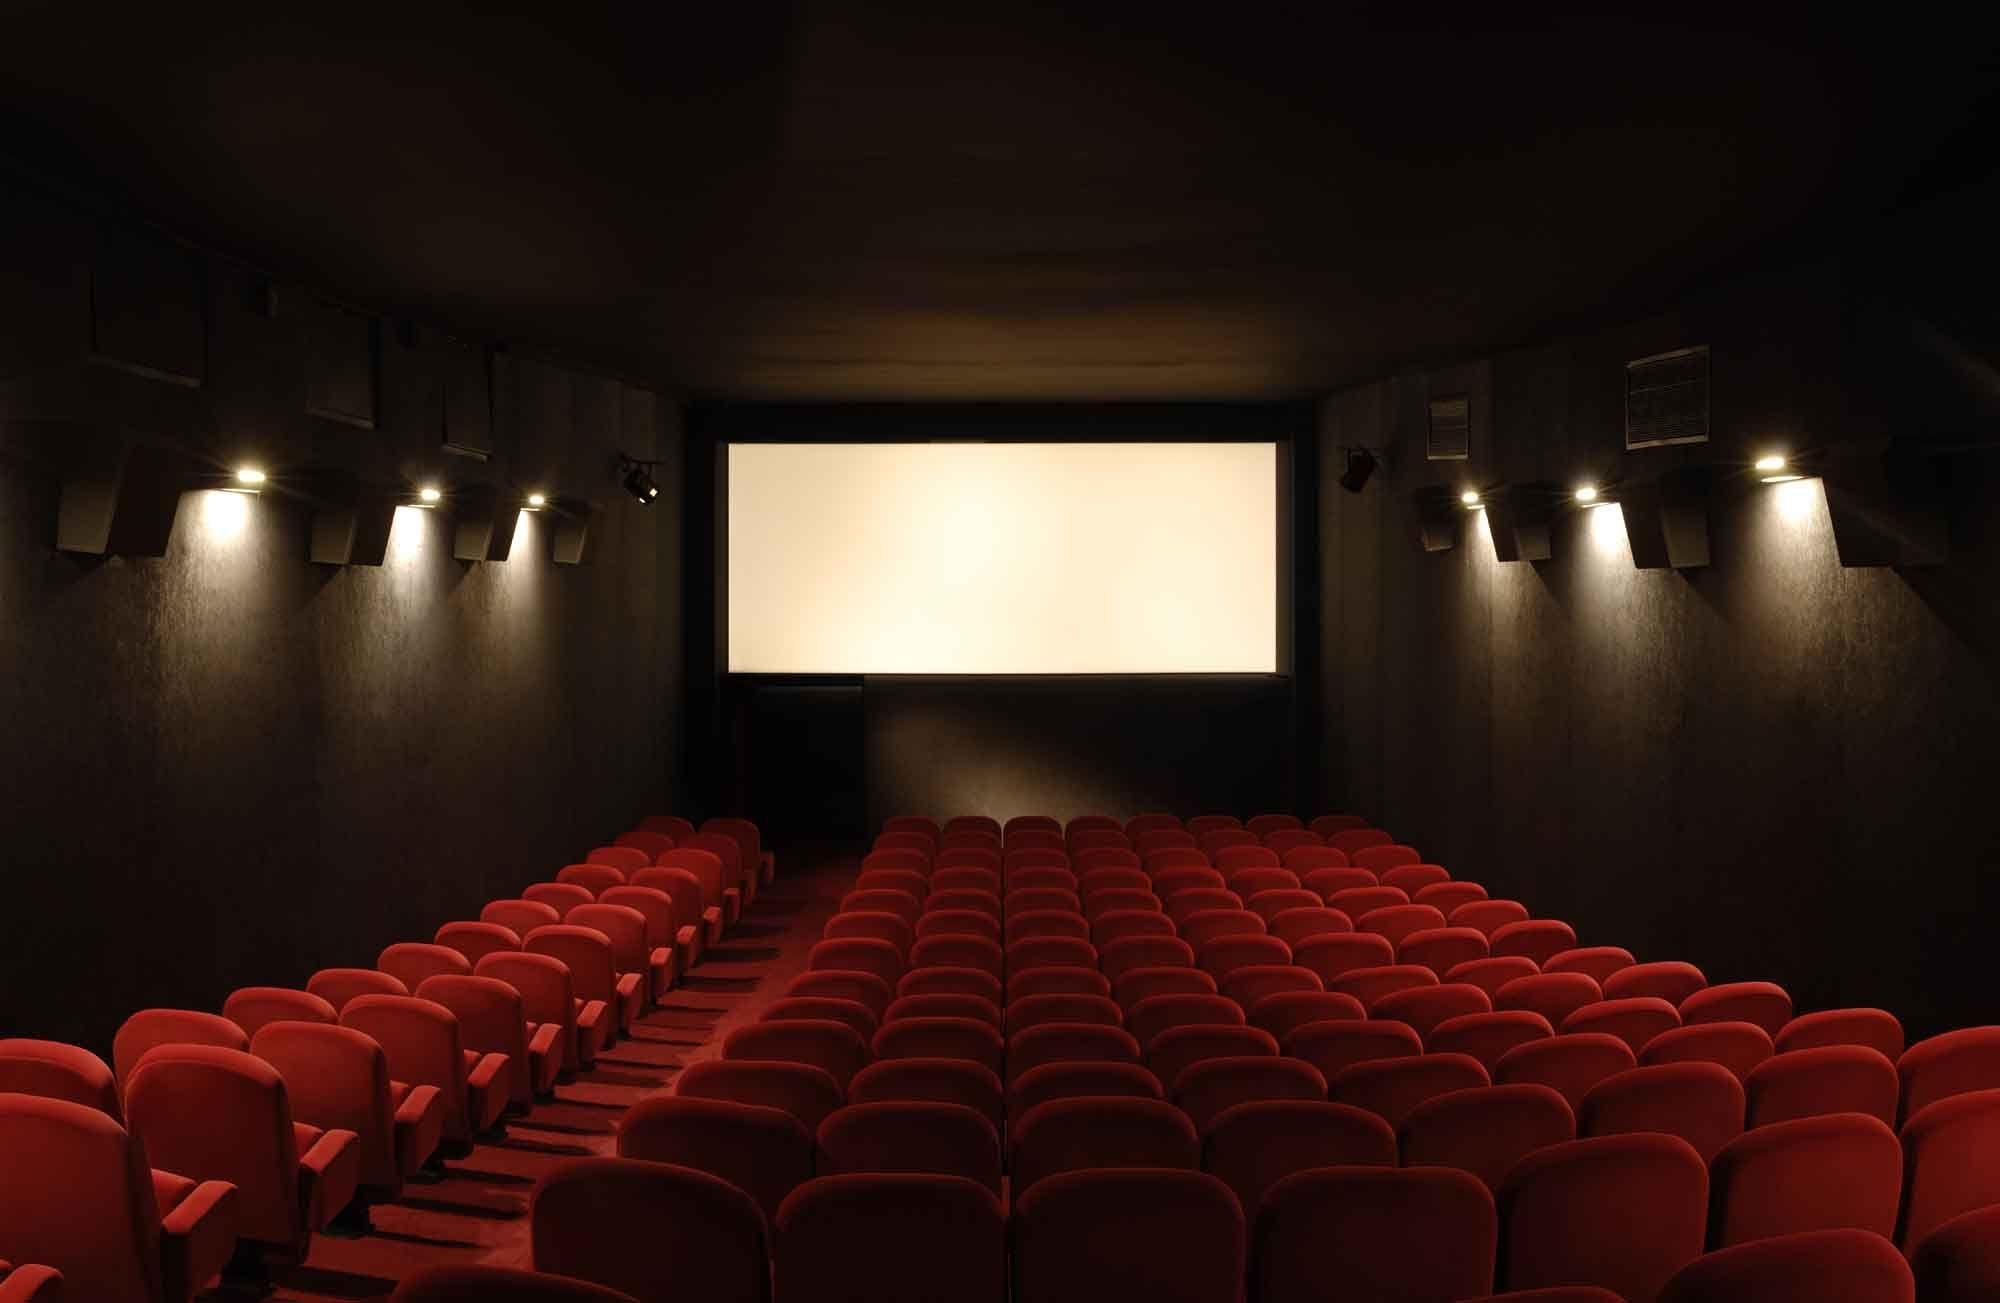 Te llevan a ver una peli al cine...